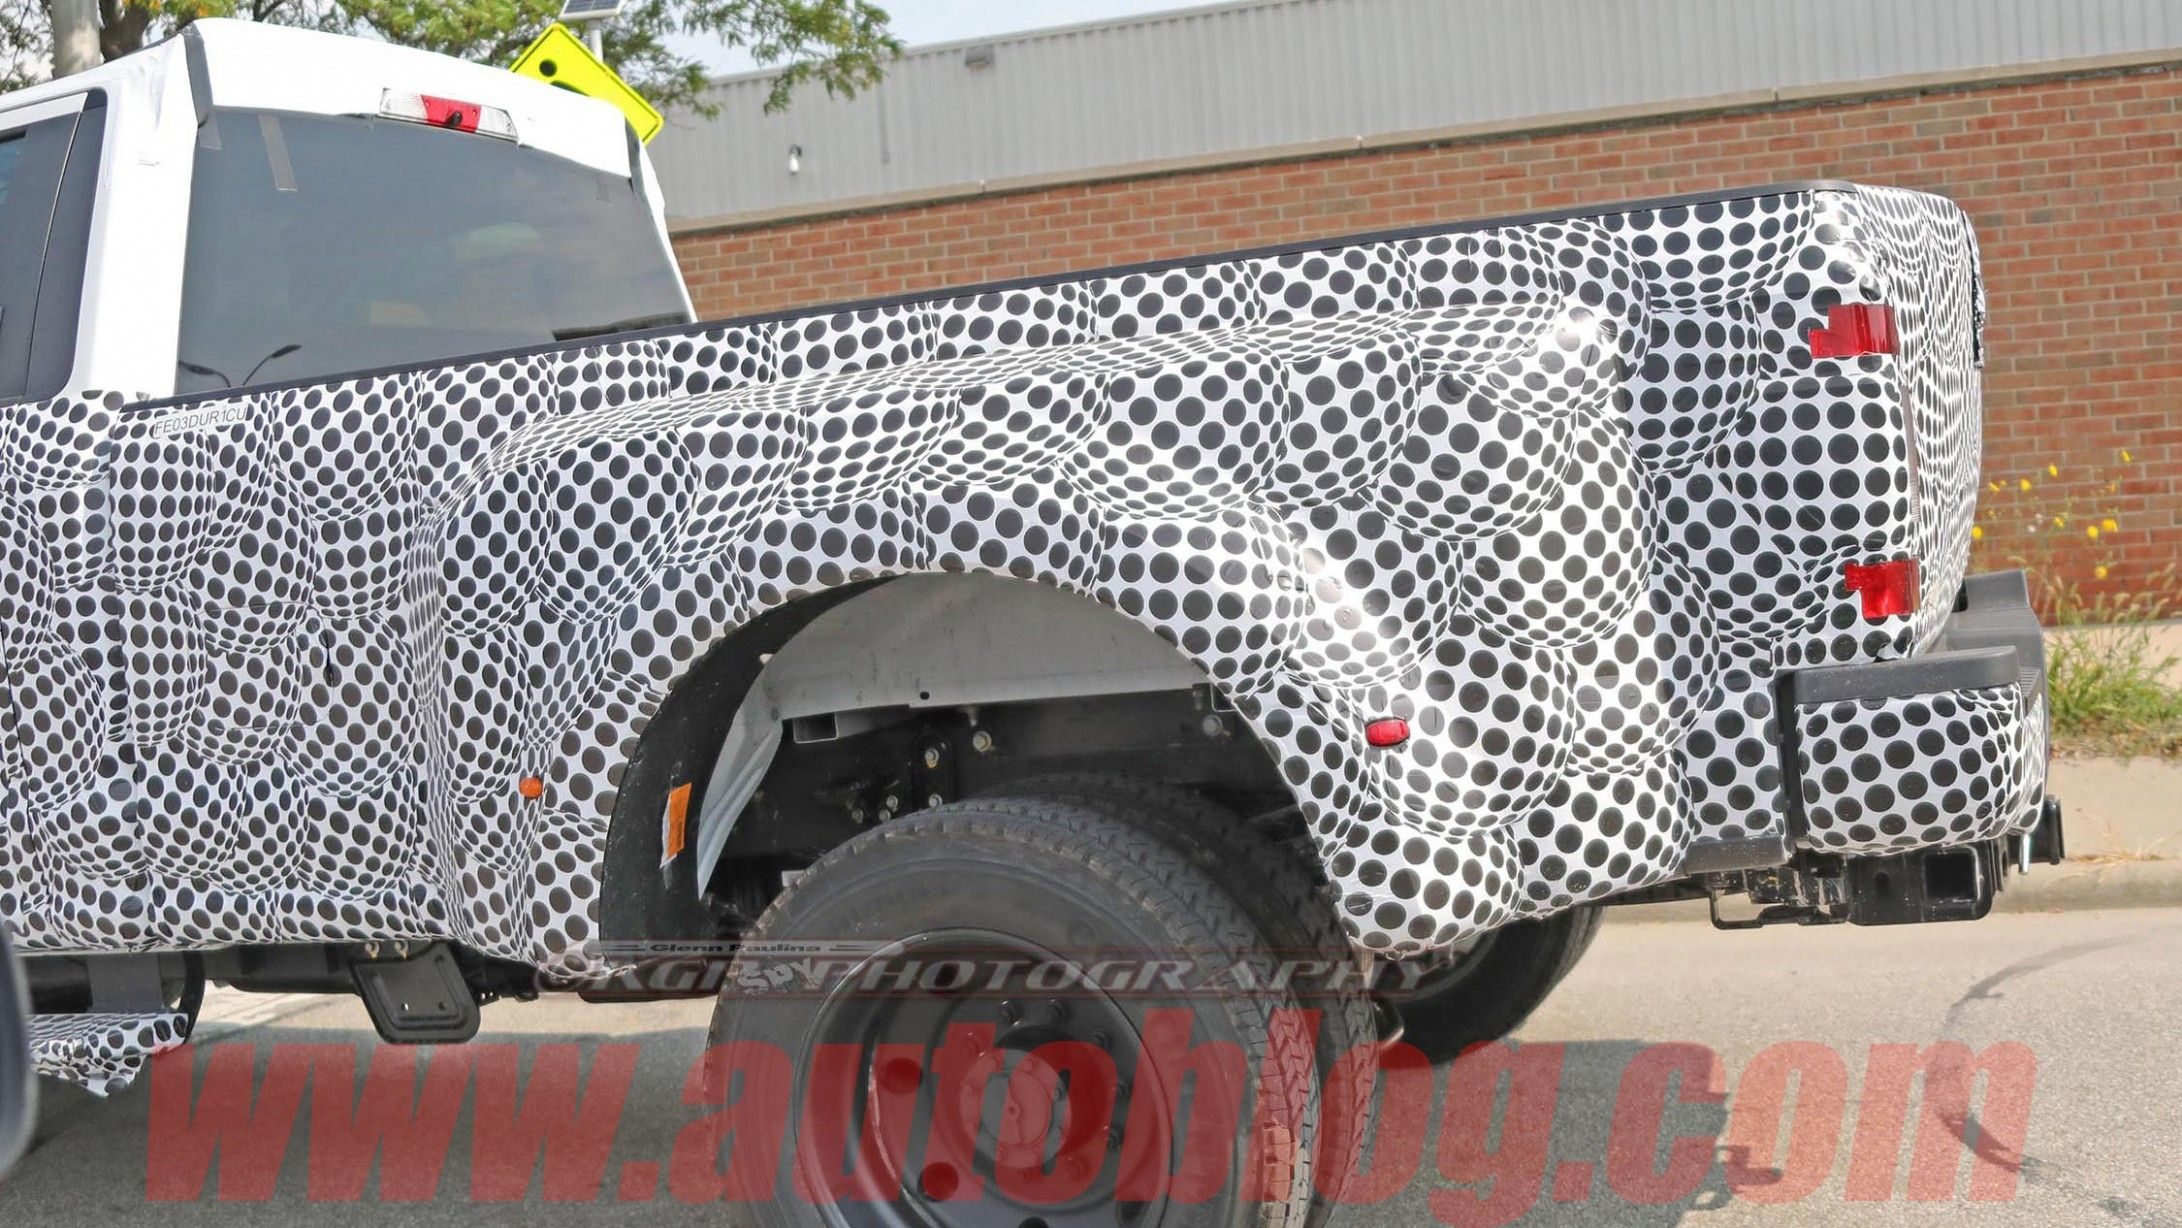 2020 Spy Shots Ford F350 Diesel Concept And (Dengan gambar)